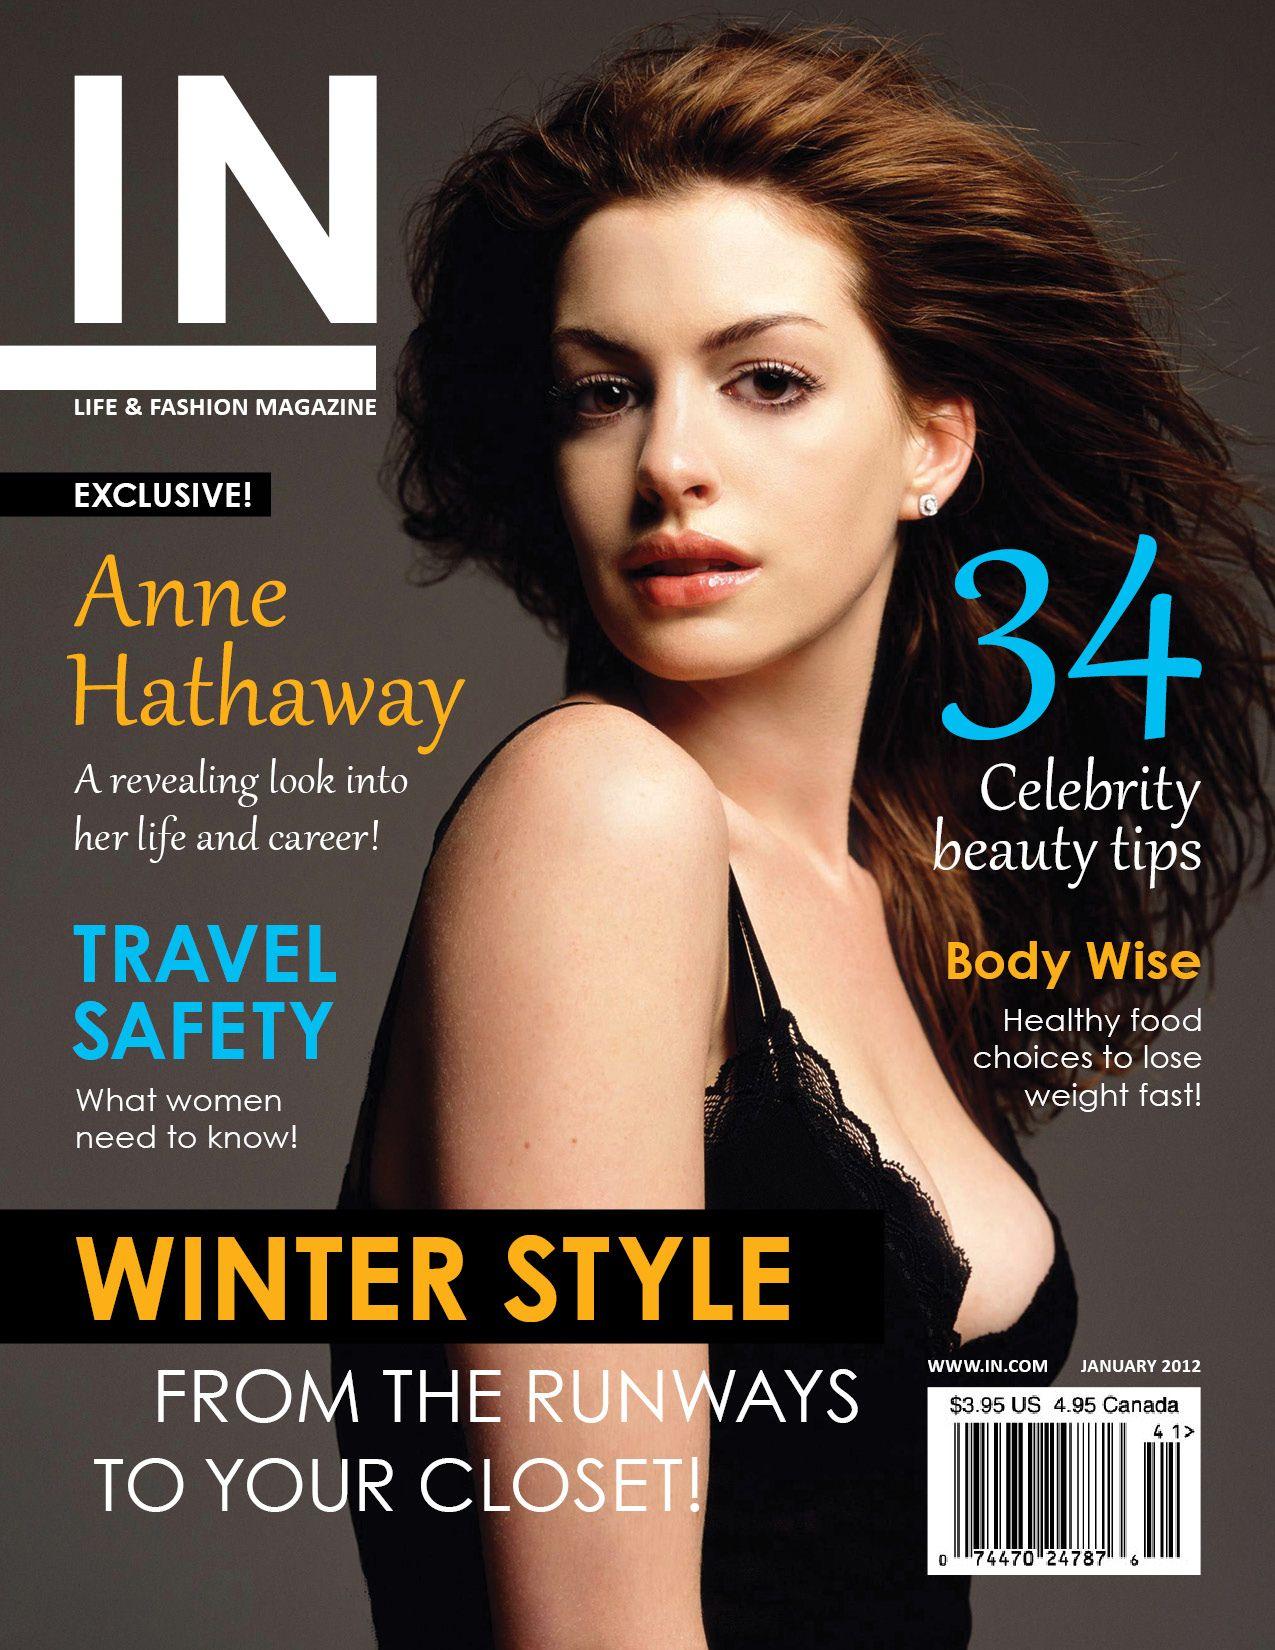 17 Best images about magazines on Pinterest | Magazine design ...